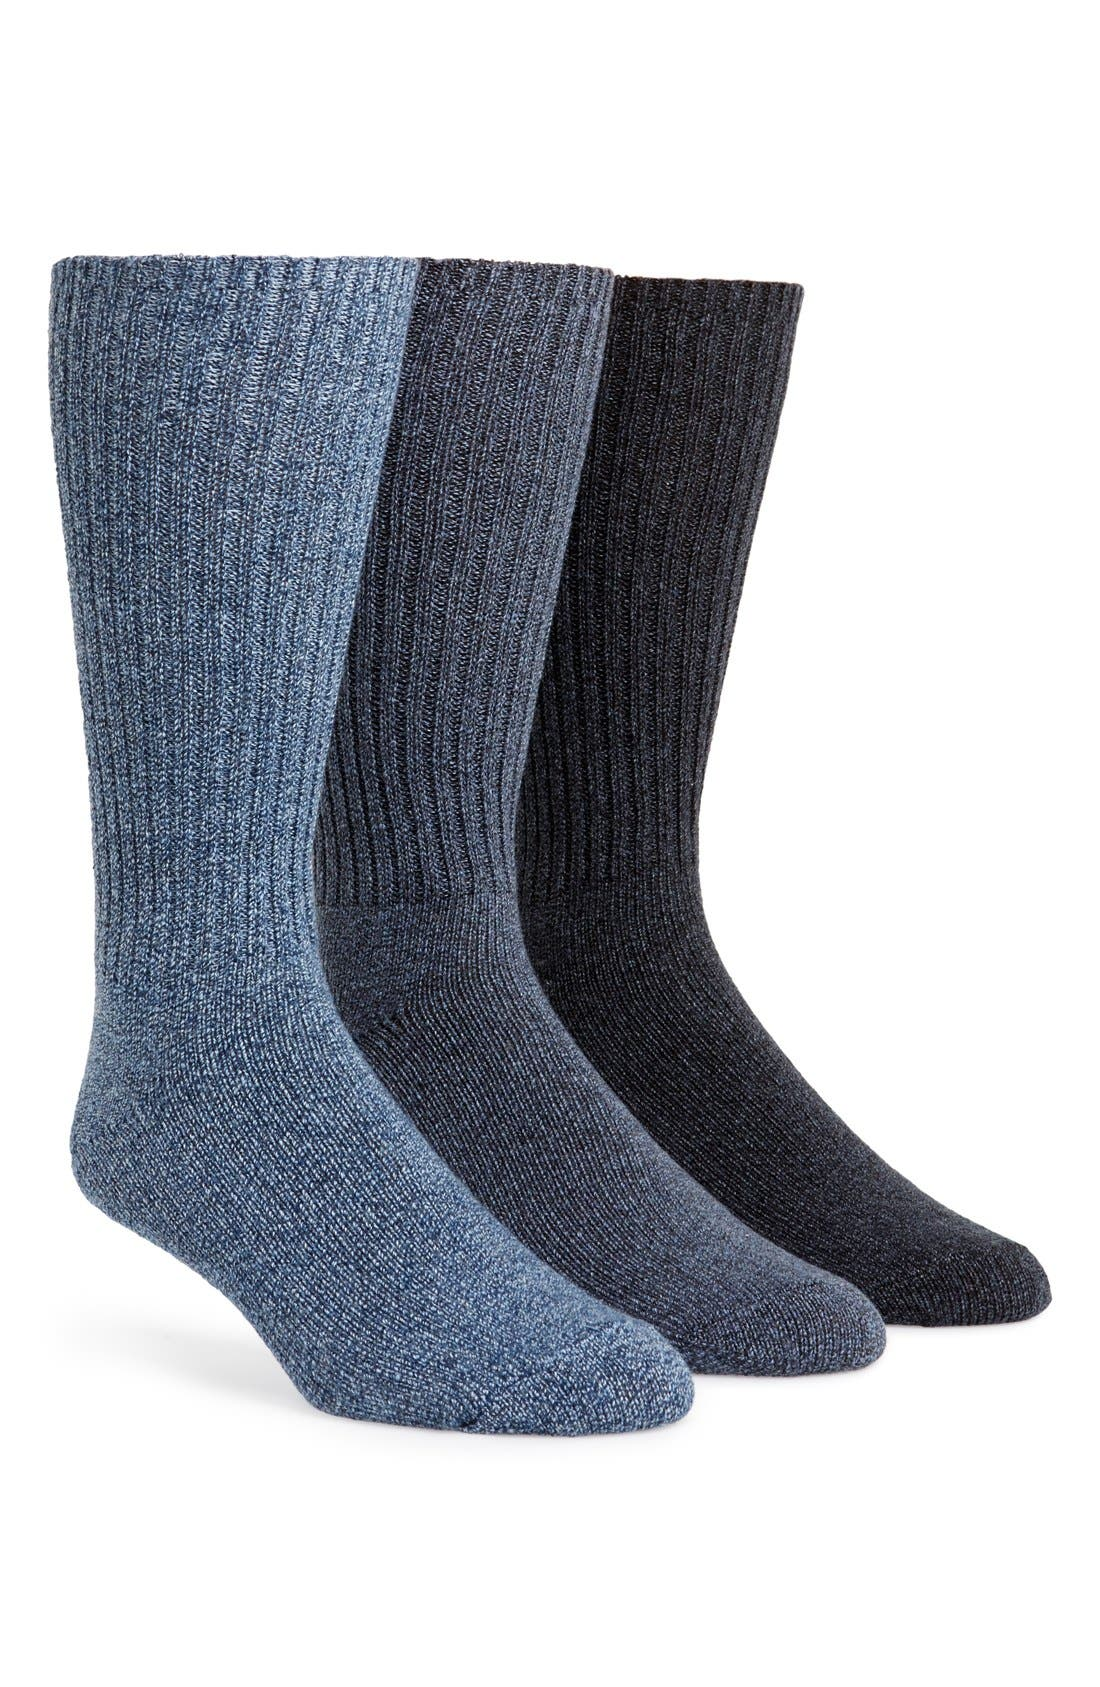 Alternate Image 1 Selected - Calvin Klein 3-Pack Casual Socks